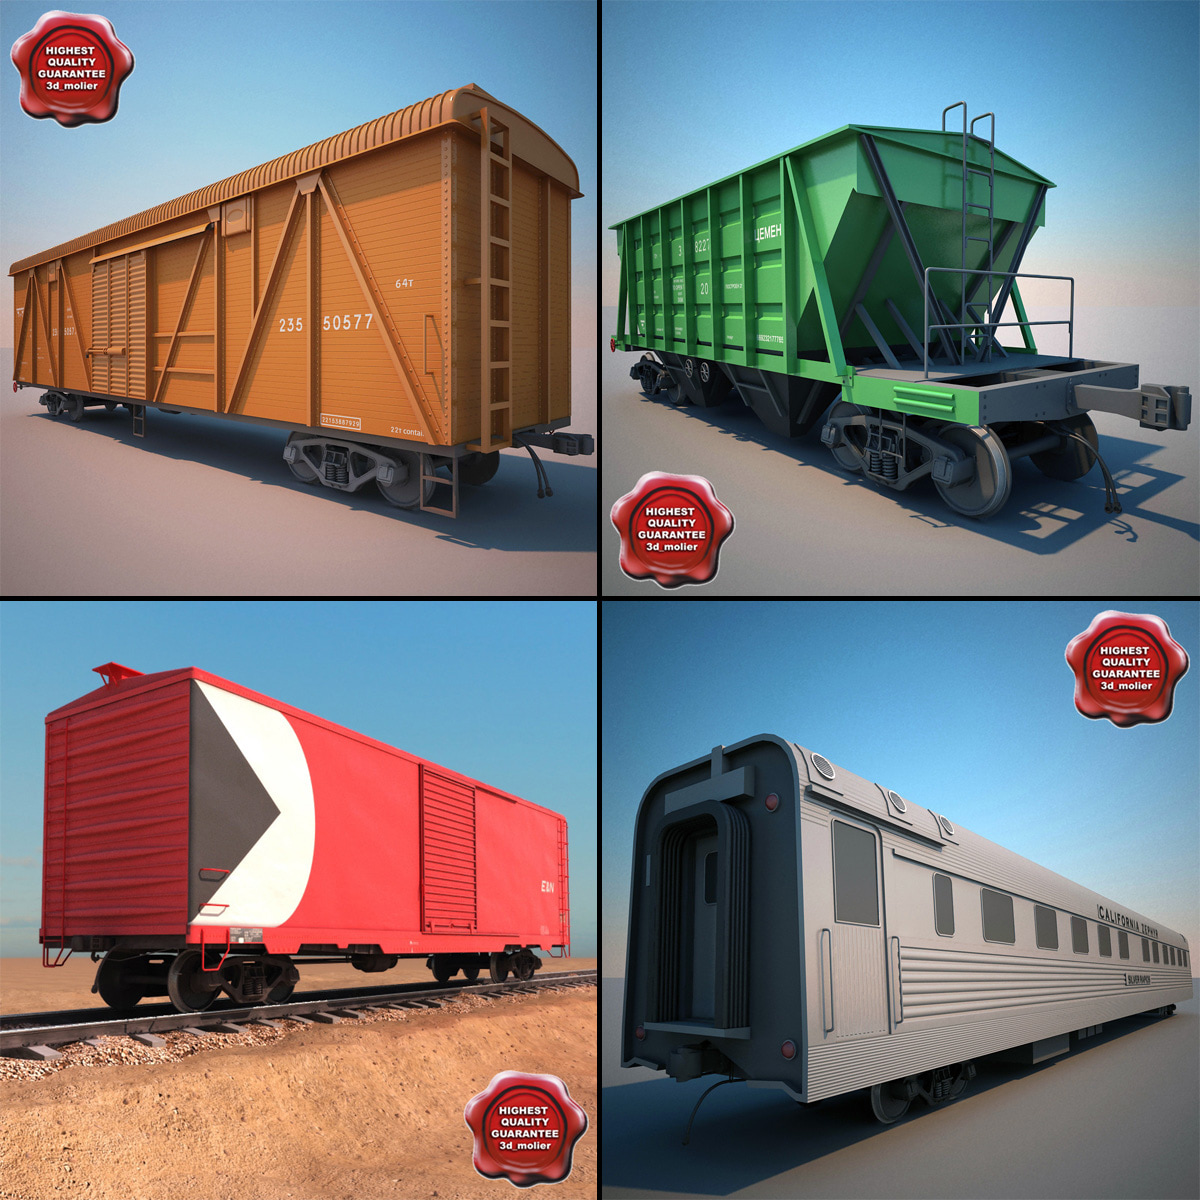 Trains_Collection_v1_000.jpg